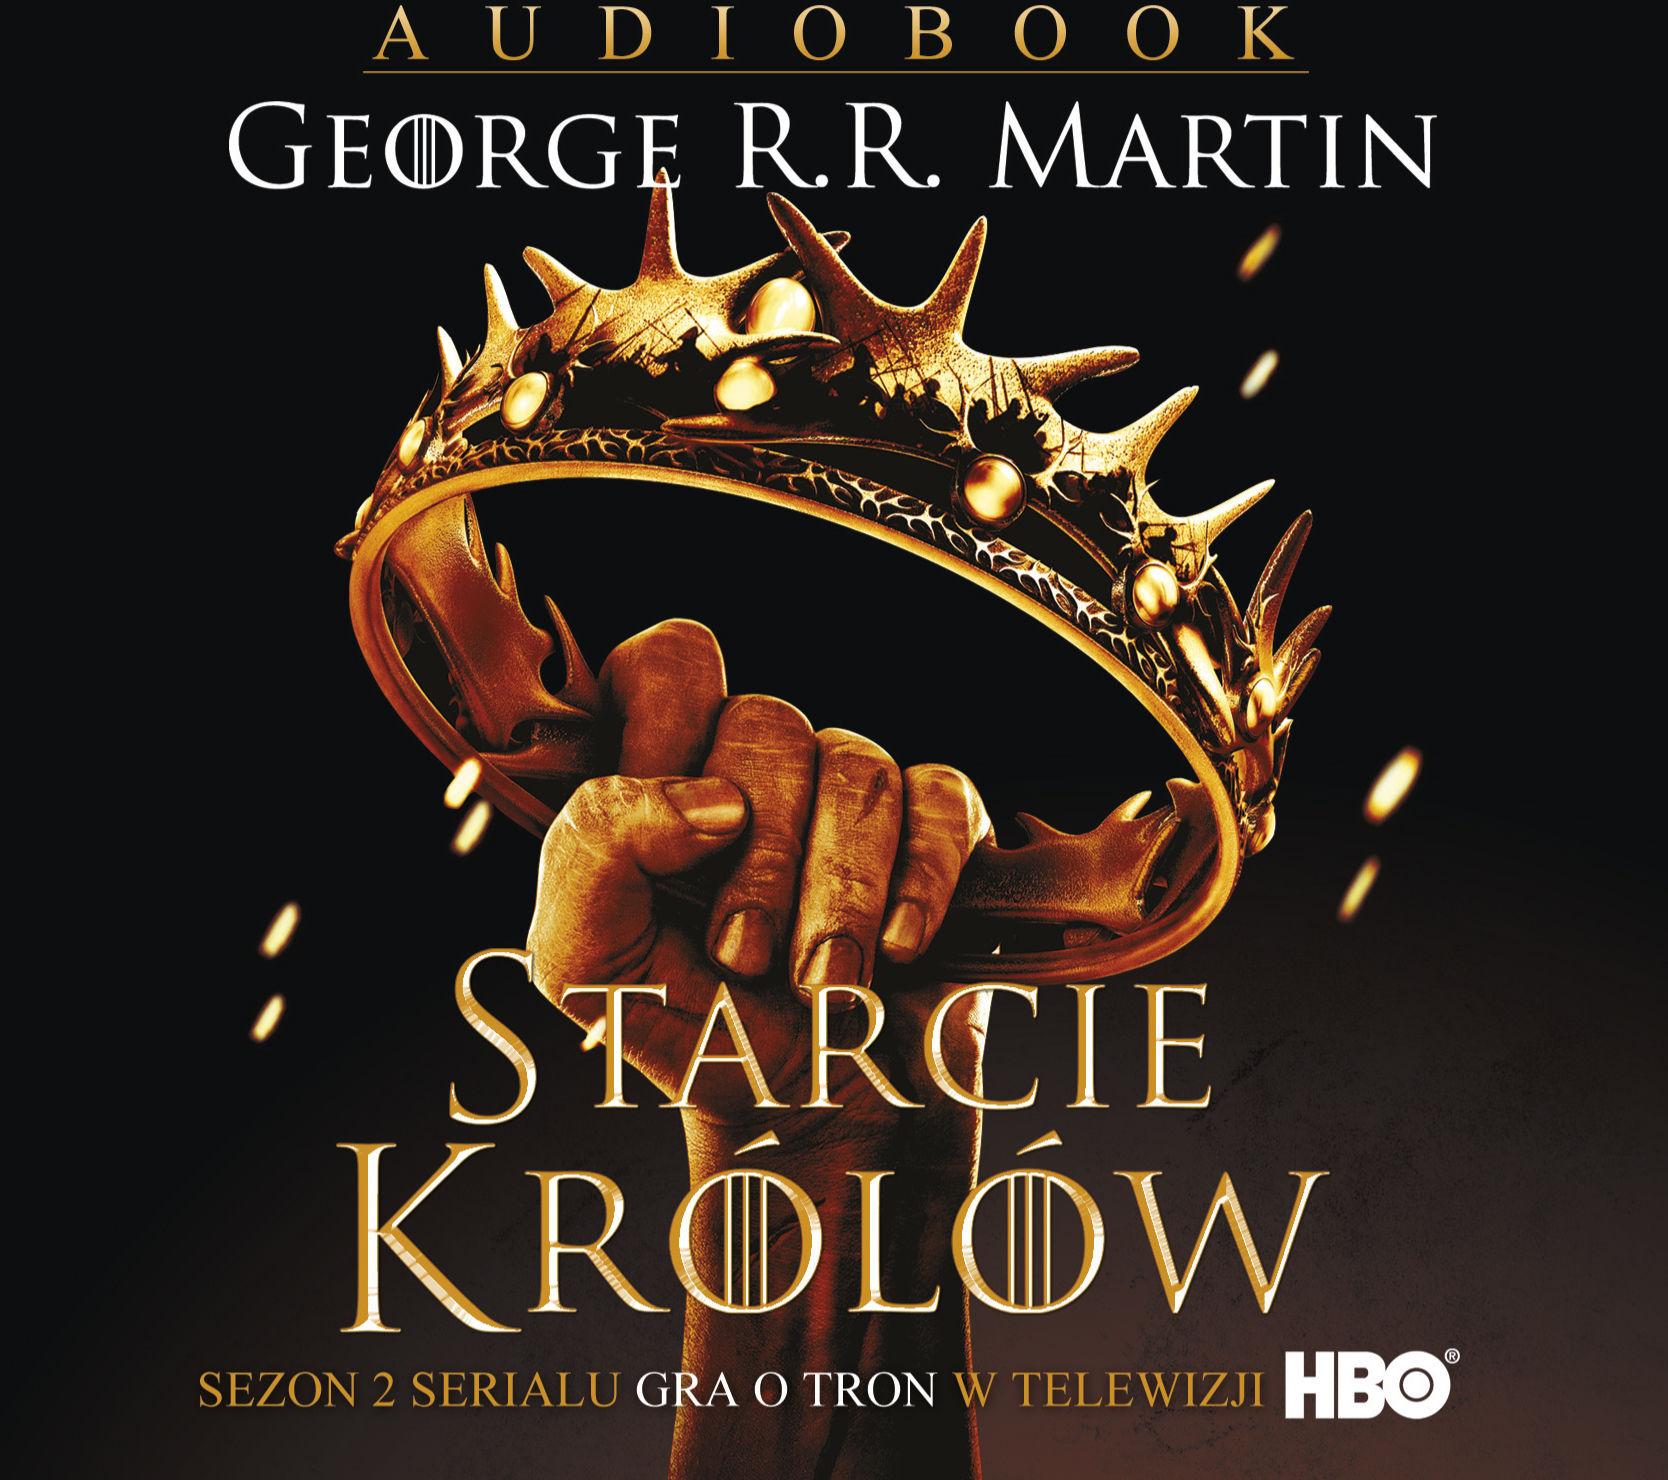 Starcie królów - George R.R. Martin - audiobook